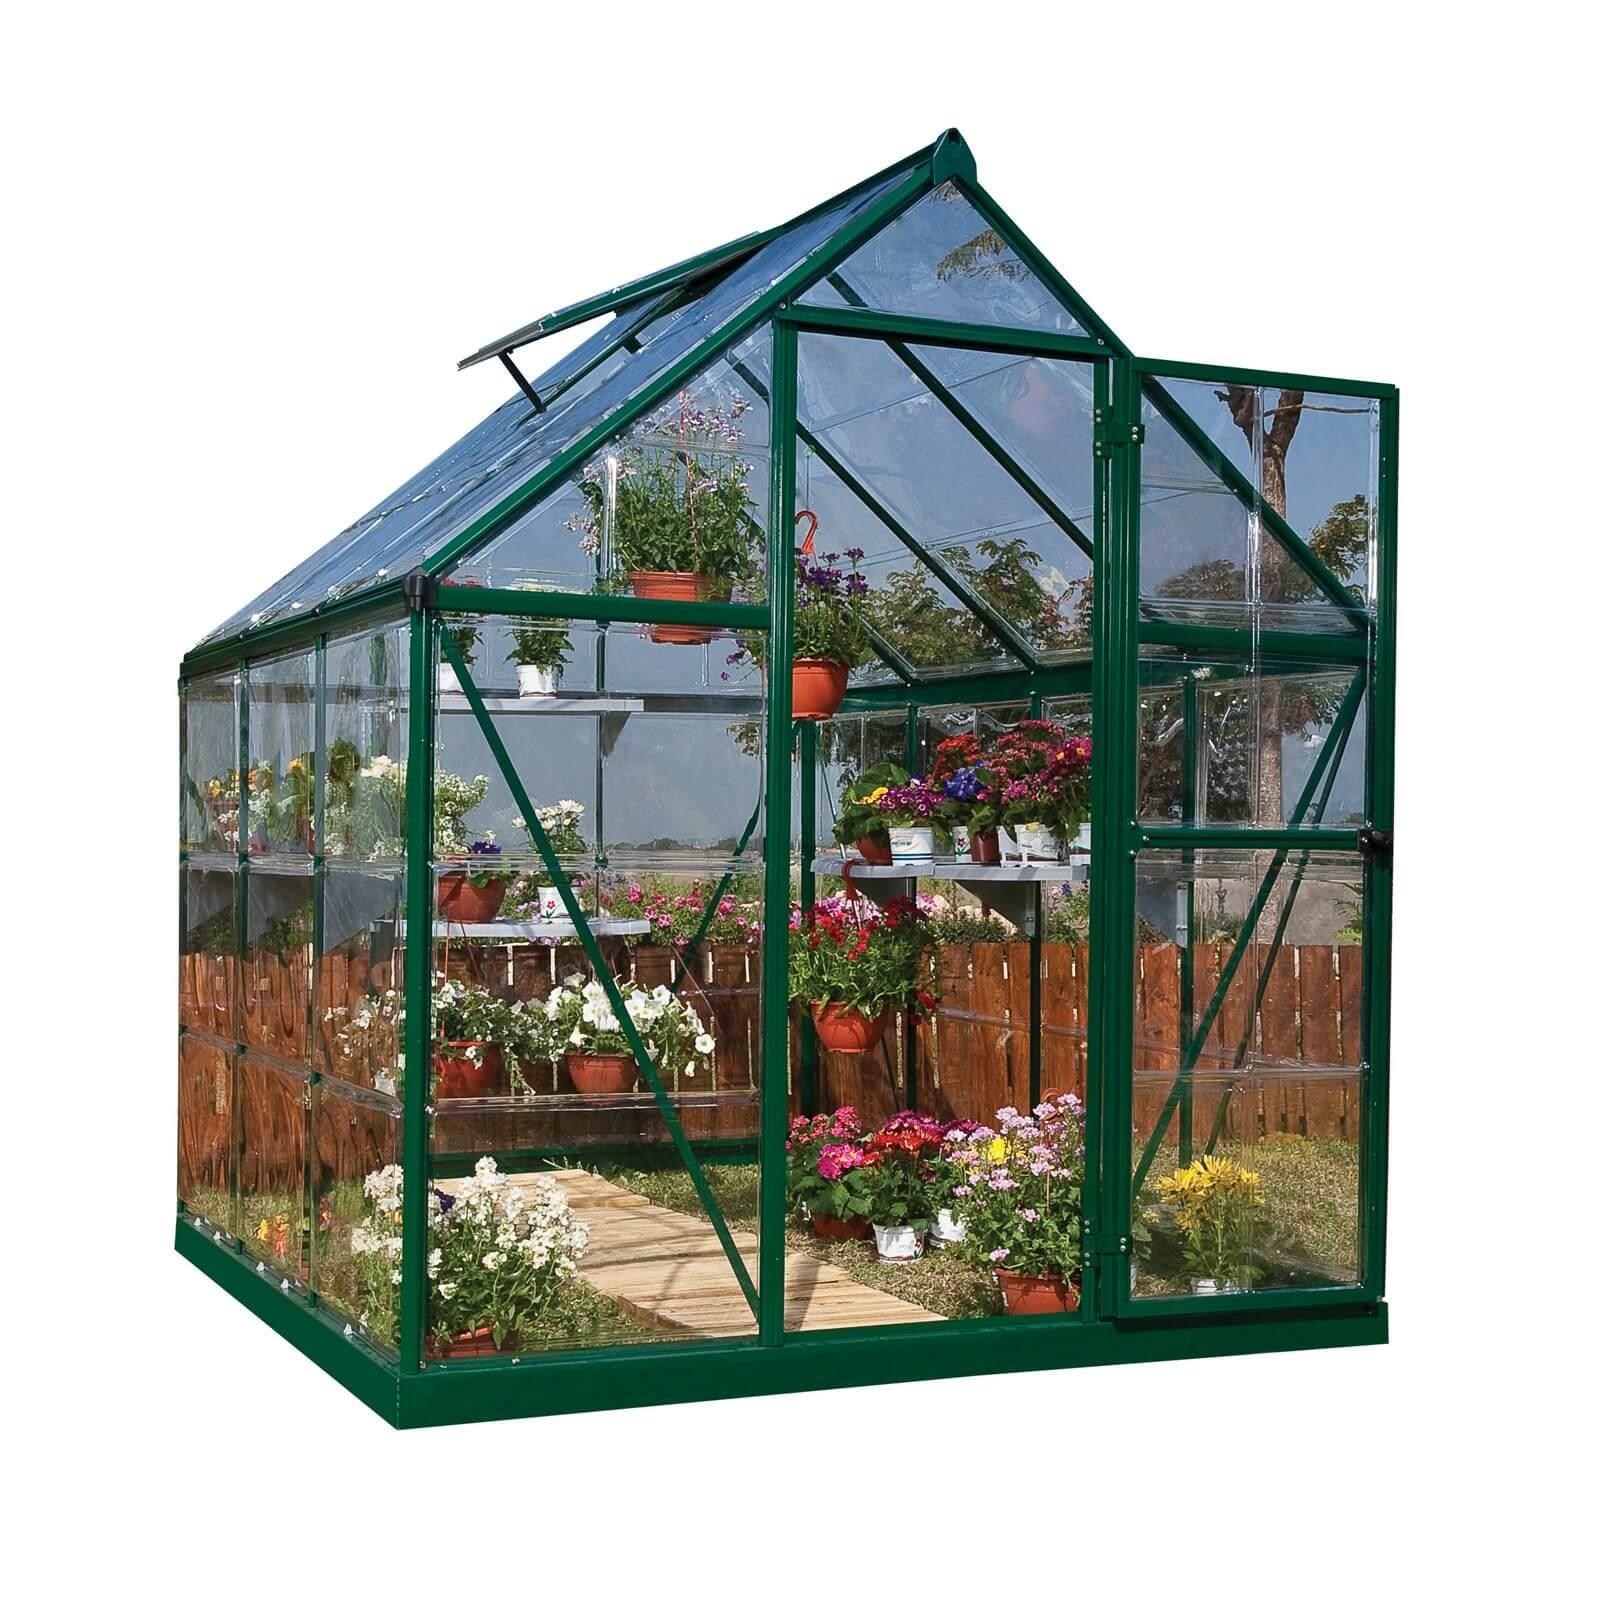 Palram Harmony Green Greenhouse - 6 x 6ft